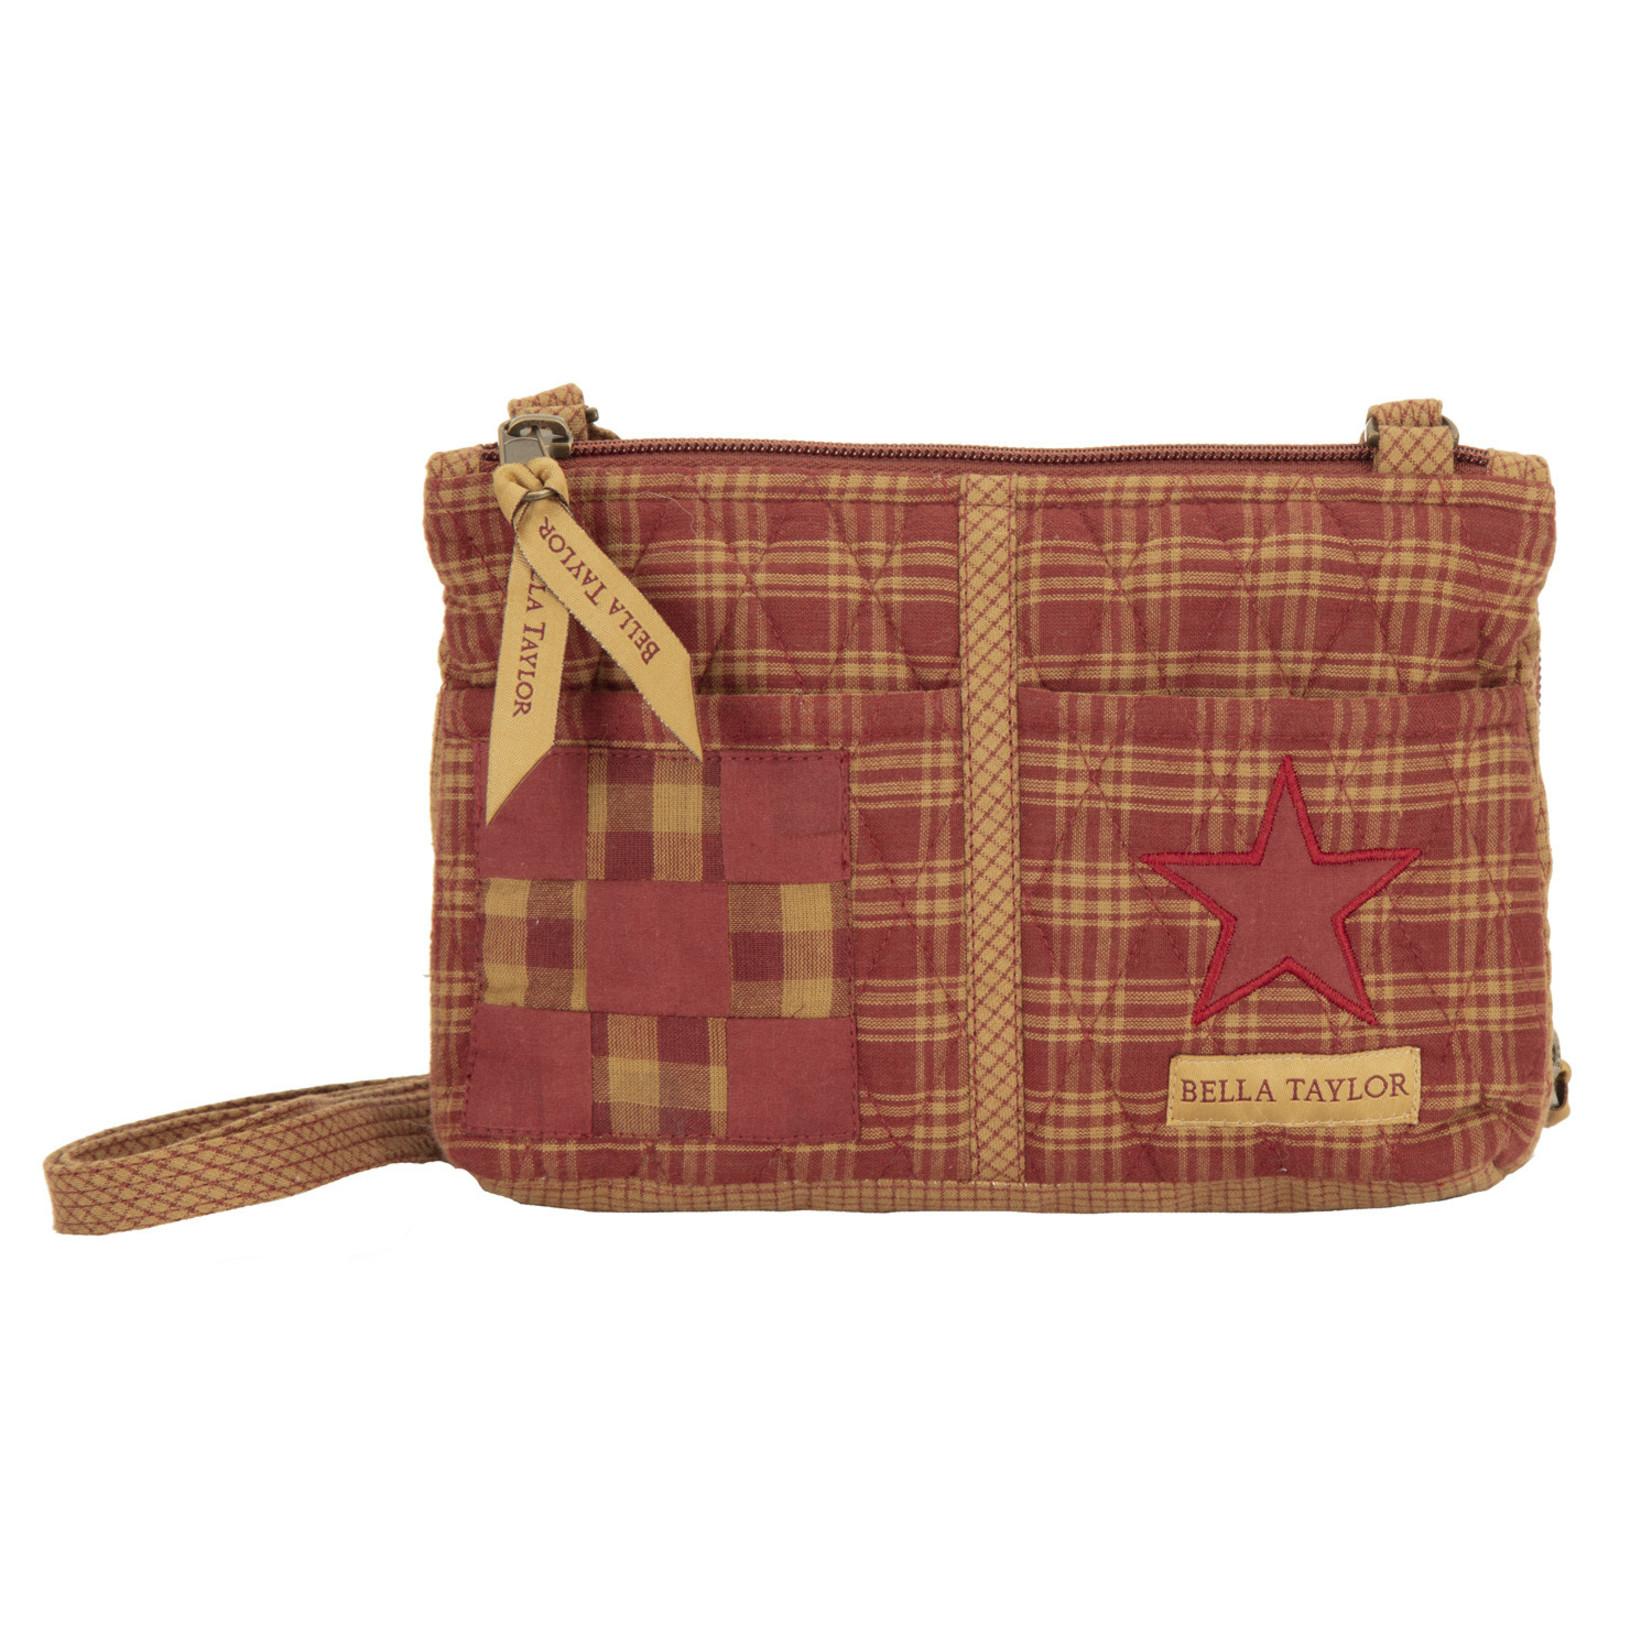 Bella Taylor Ninepatch Star - Essentials handbag